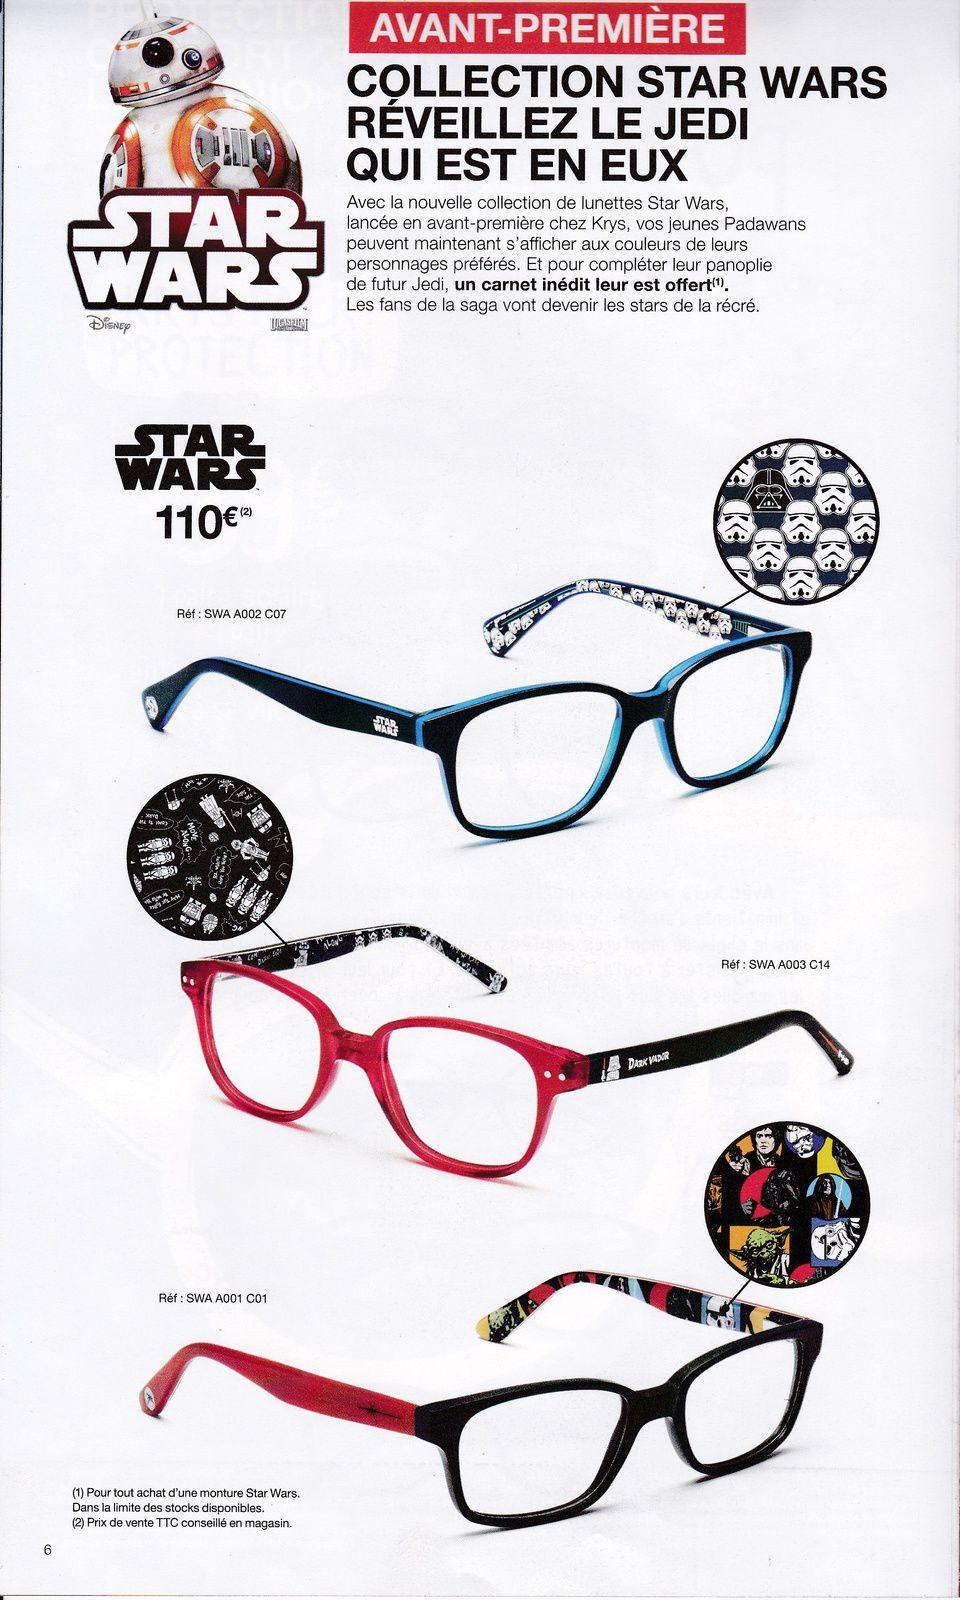 Offre Star Wars chez Krys - starwars-fandefrance.over-blog.com f289119be94f